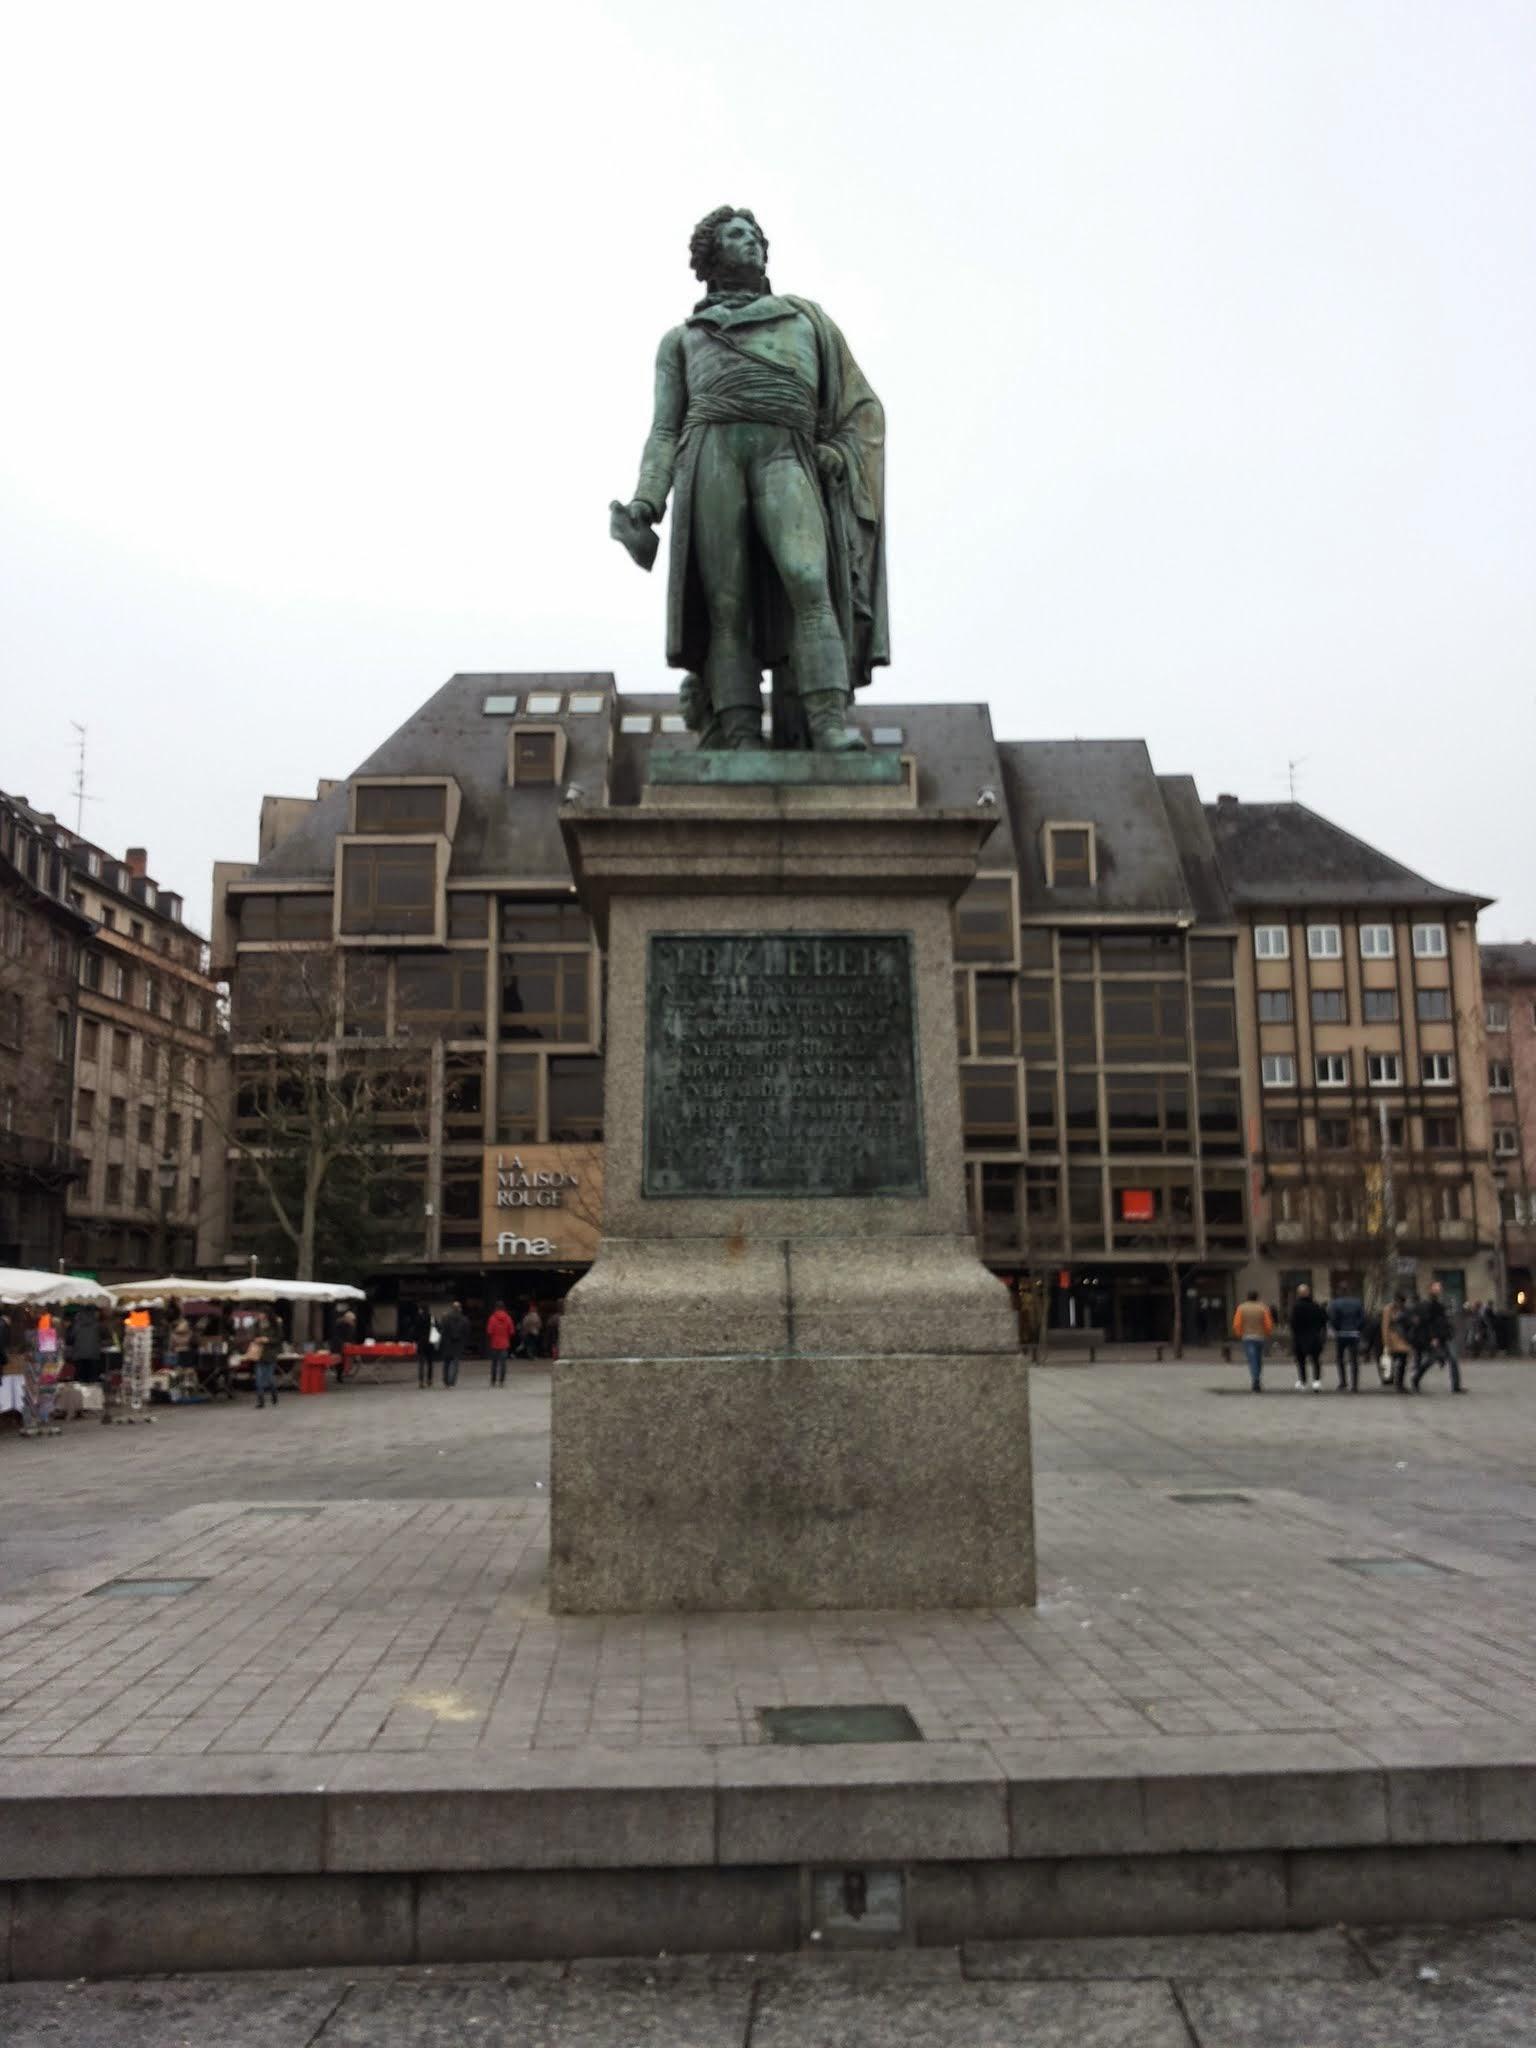 Kleber, Generalul lui Napoleon